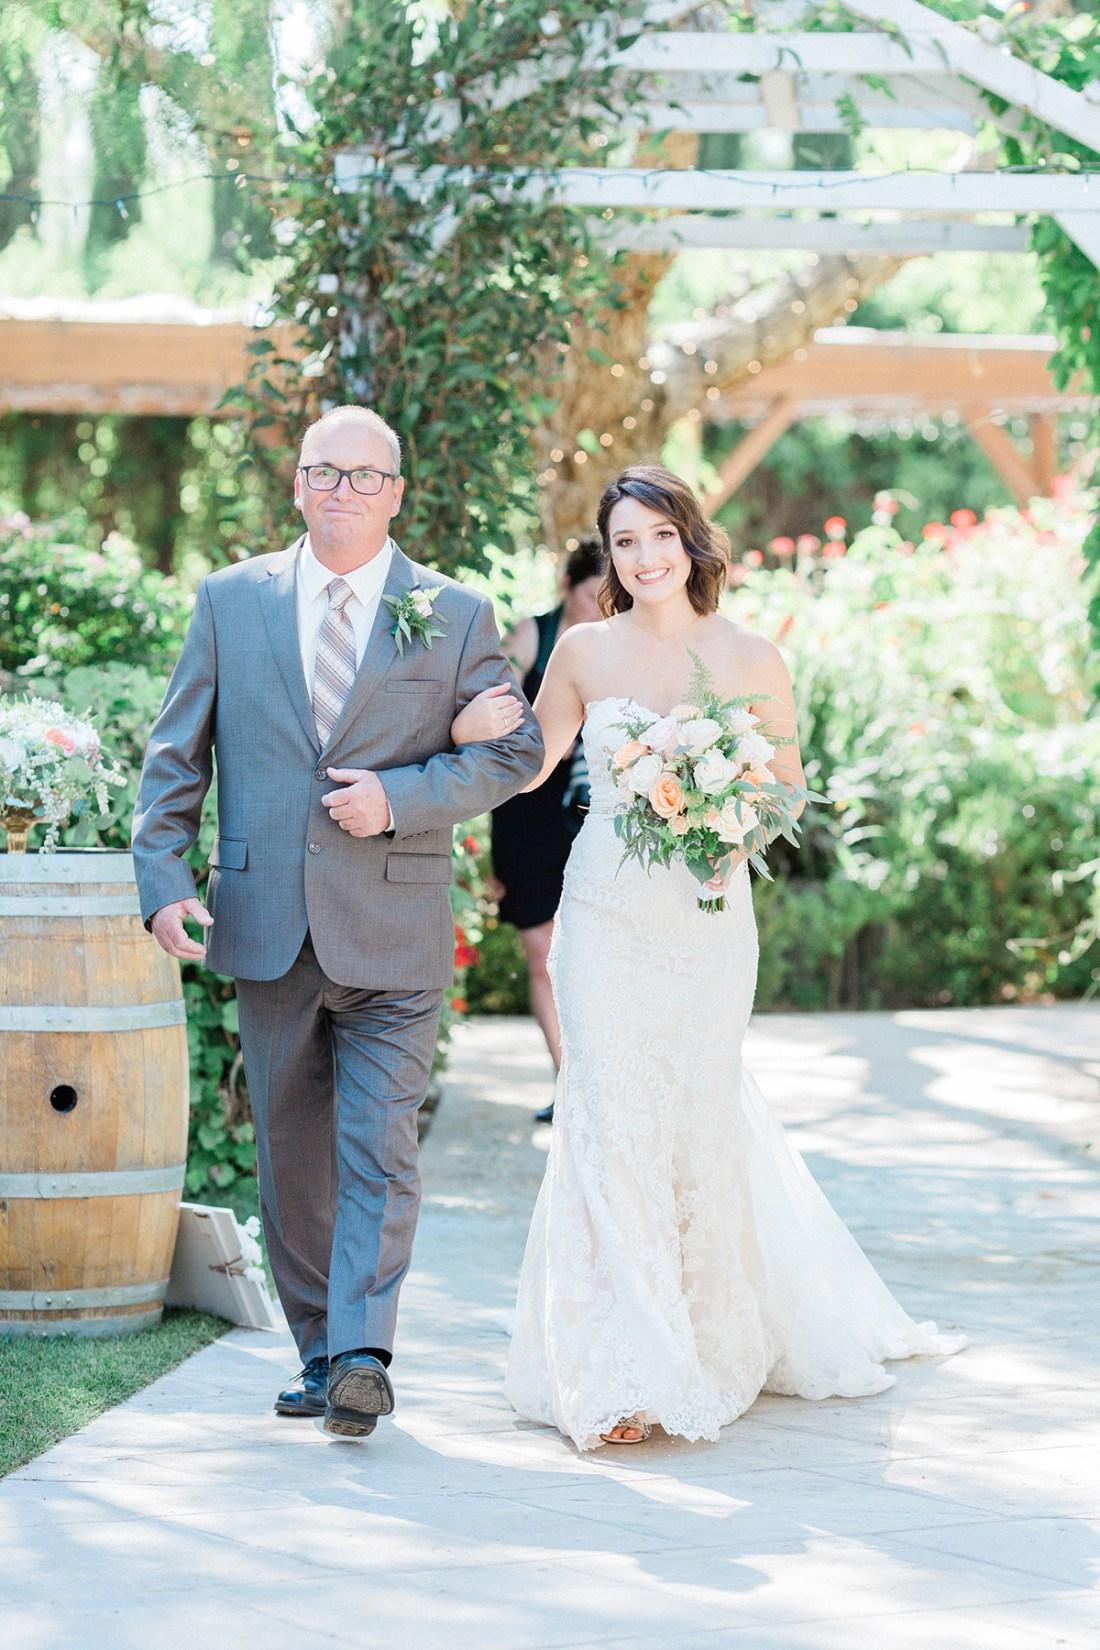 Our Wedding Ceremony- Here Comes the Bride | A Good Hue